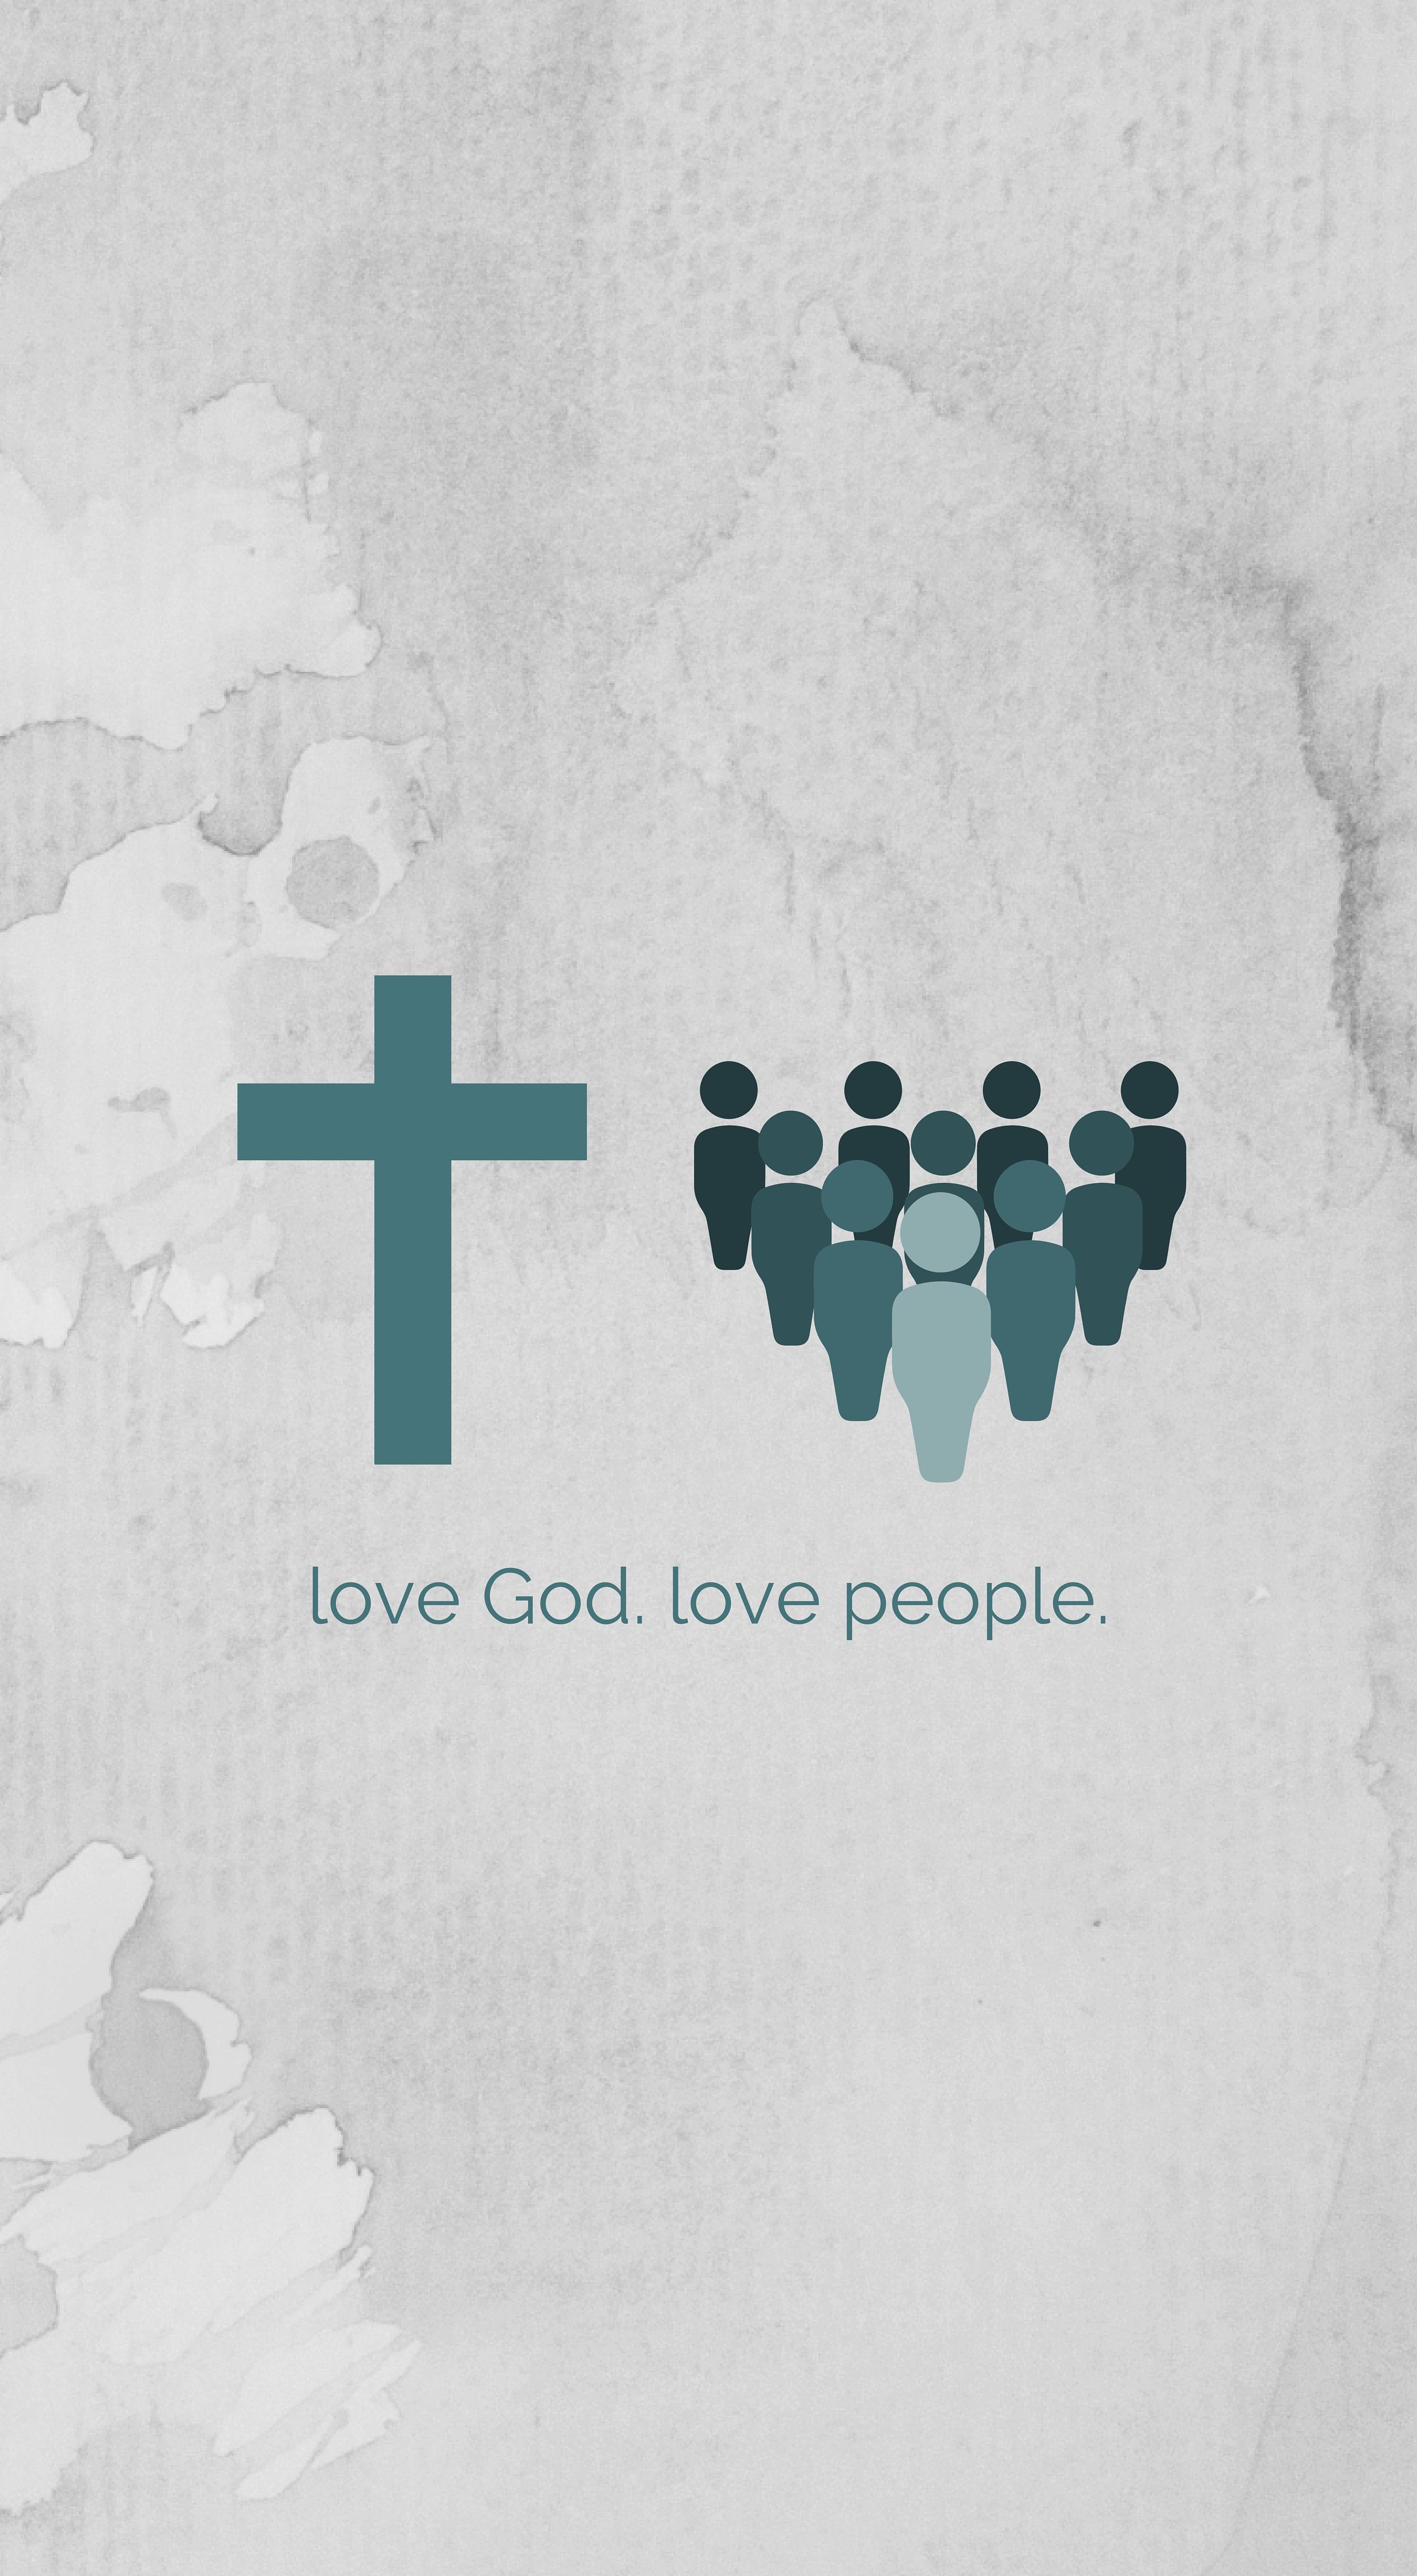 Beautiful Wallpaper Love God - 1dc4d0_9b602a13d8ac4535a893b4e78e4f725f  Collection_566476.jpg